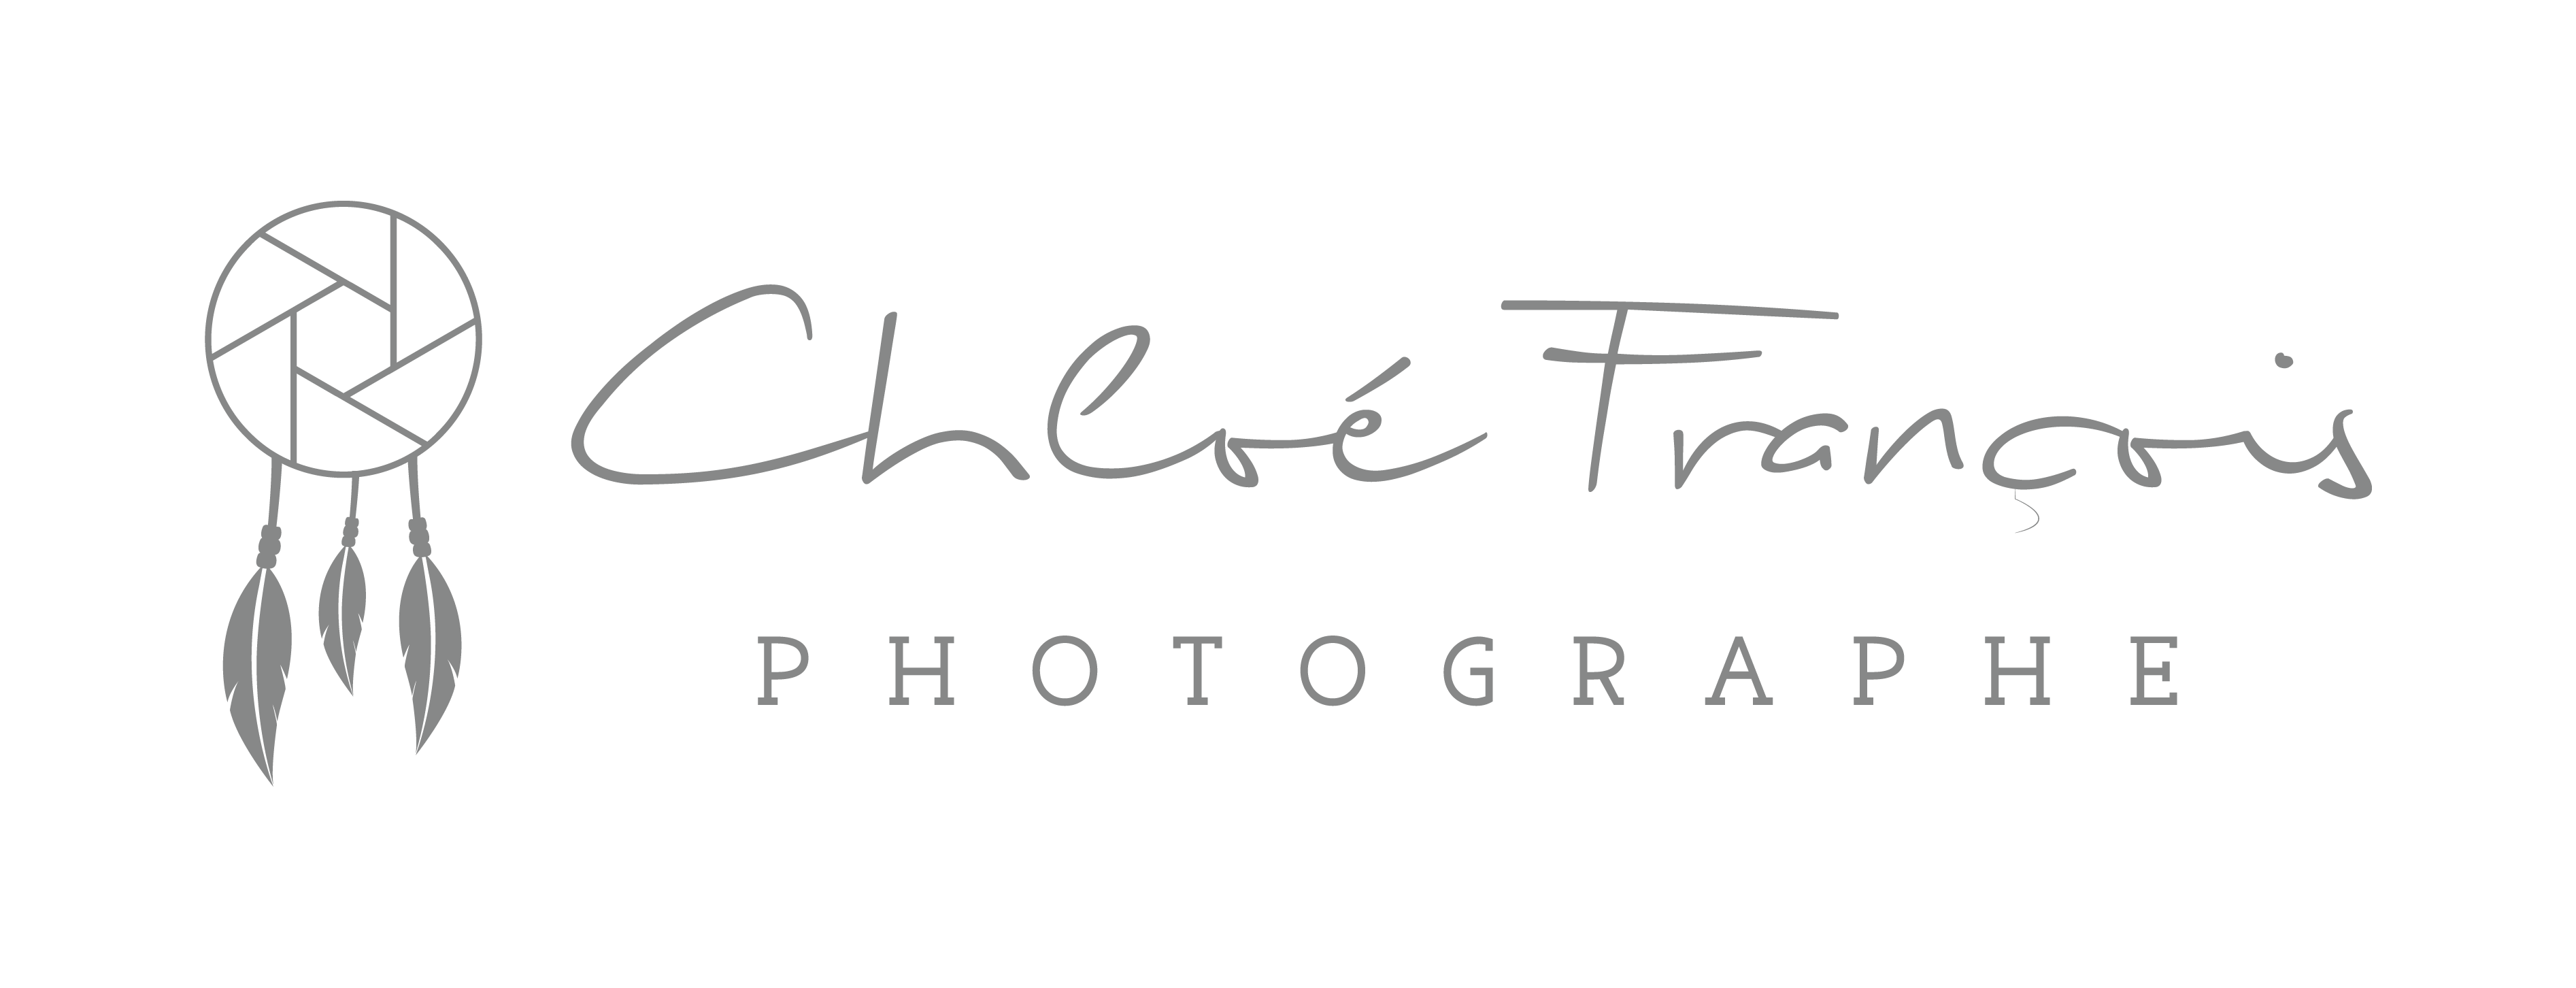 Chloé François Photographe